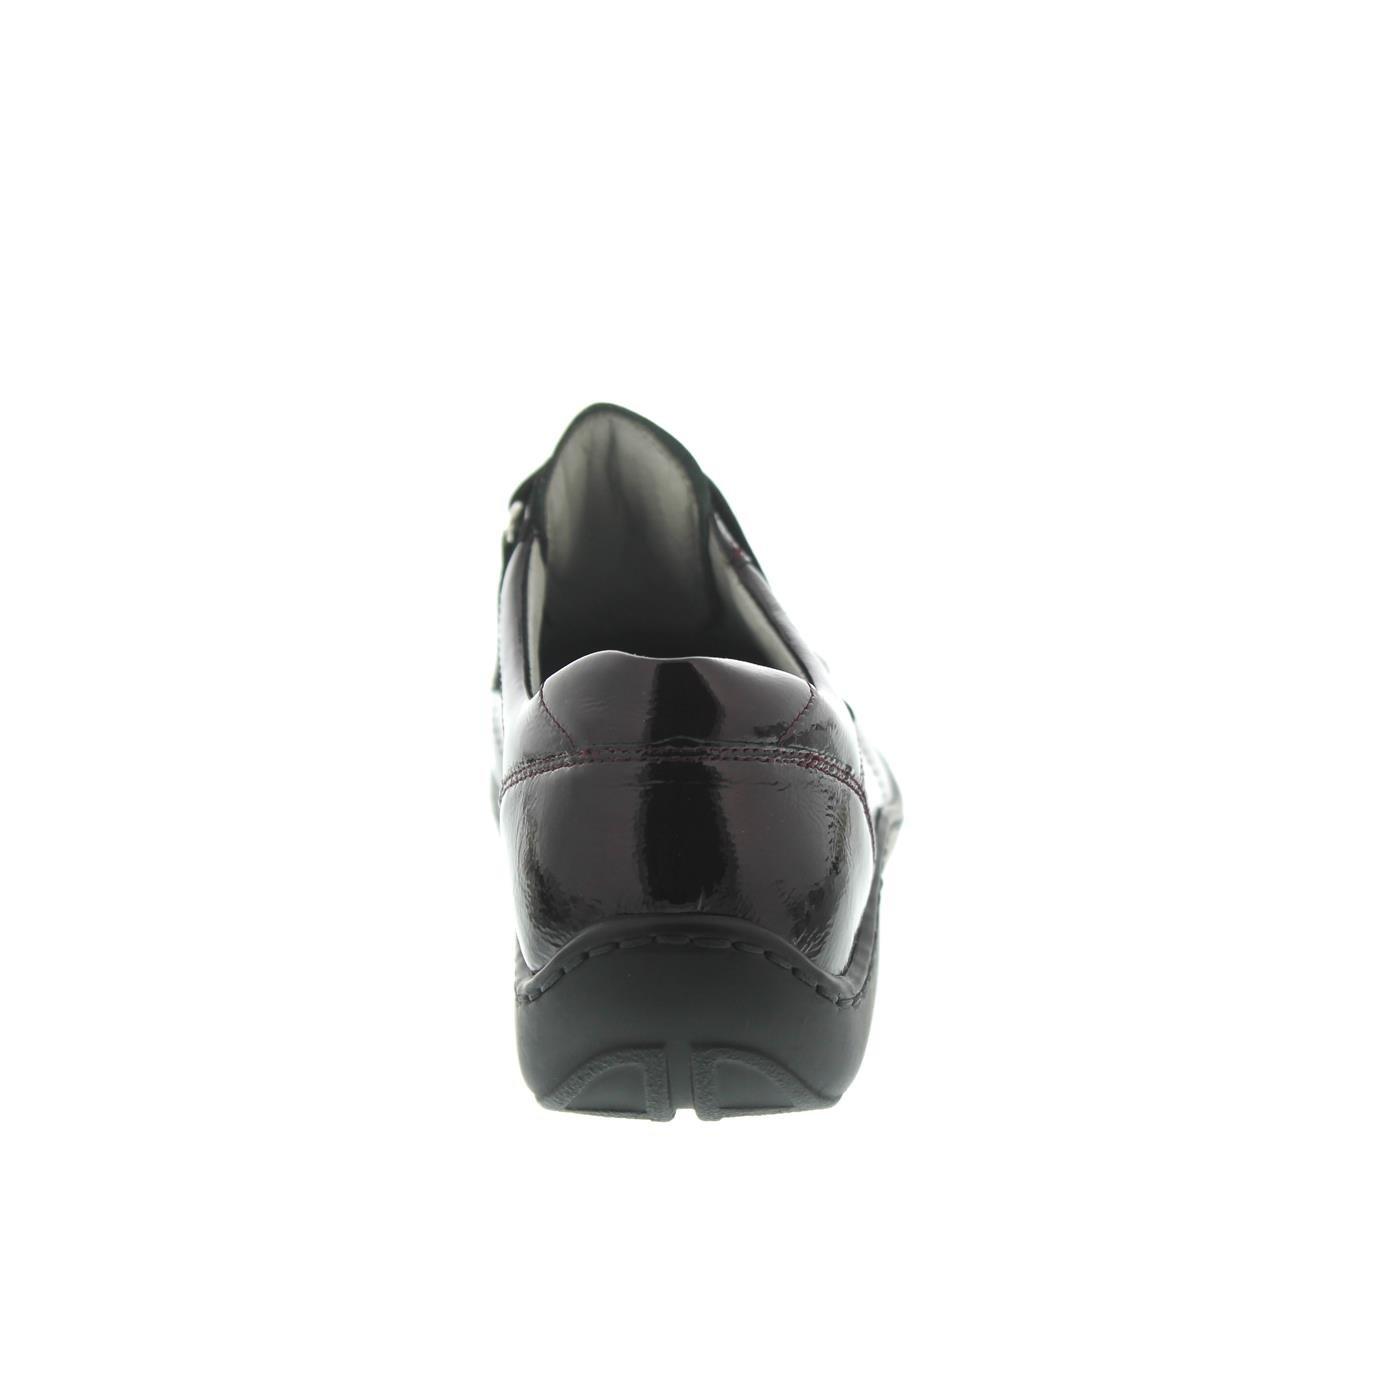 Waldlaufer Stein Velcro Verschluss Damenschuhe 39 39 Damenschuhe EU Brunello Patent 7babf7